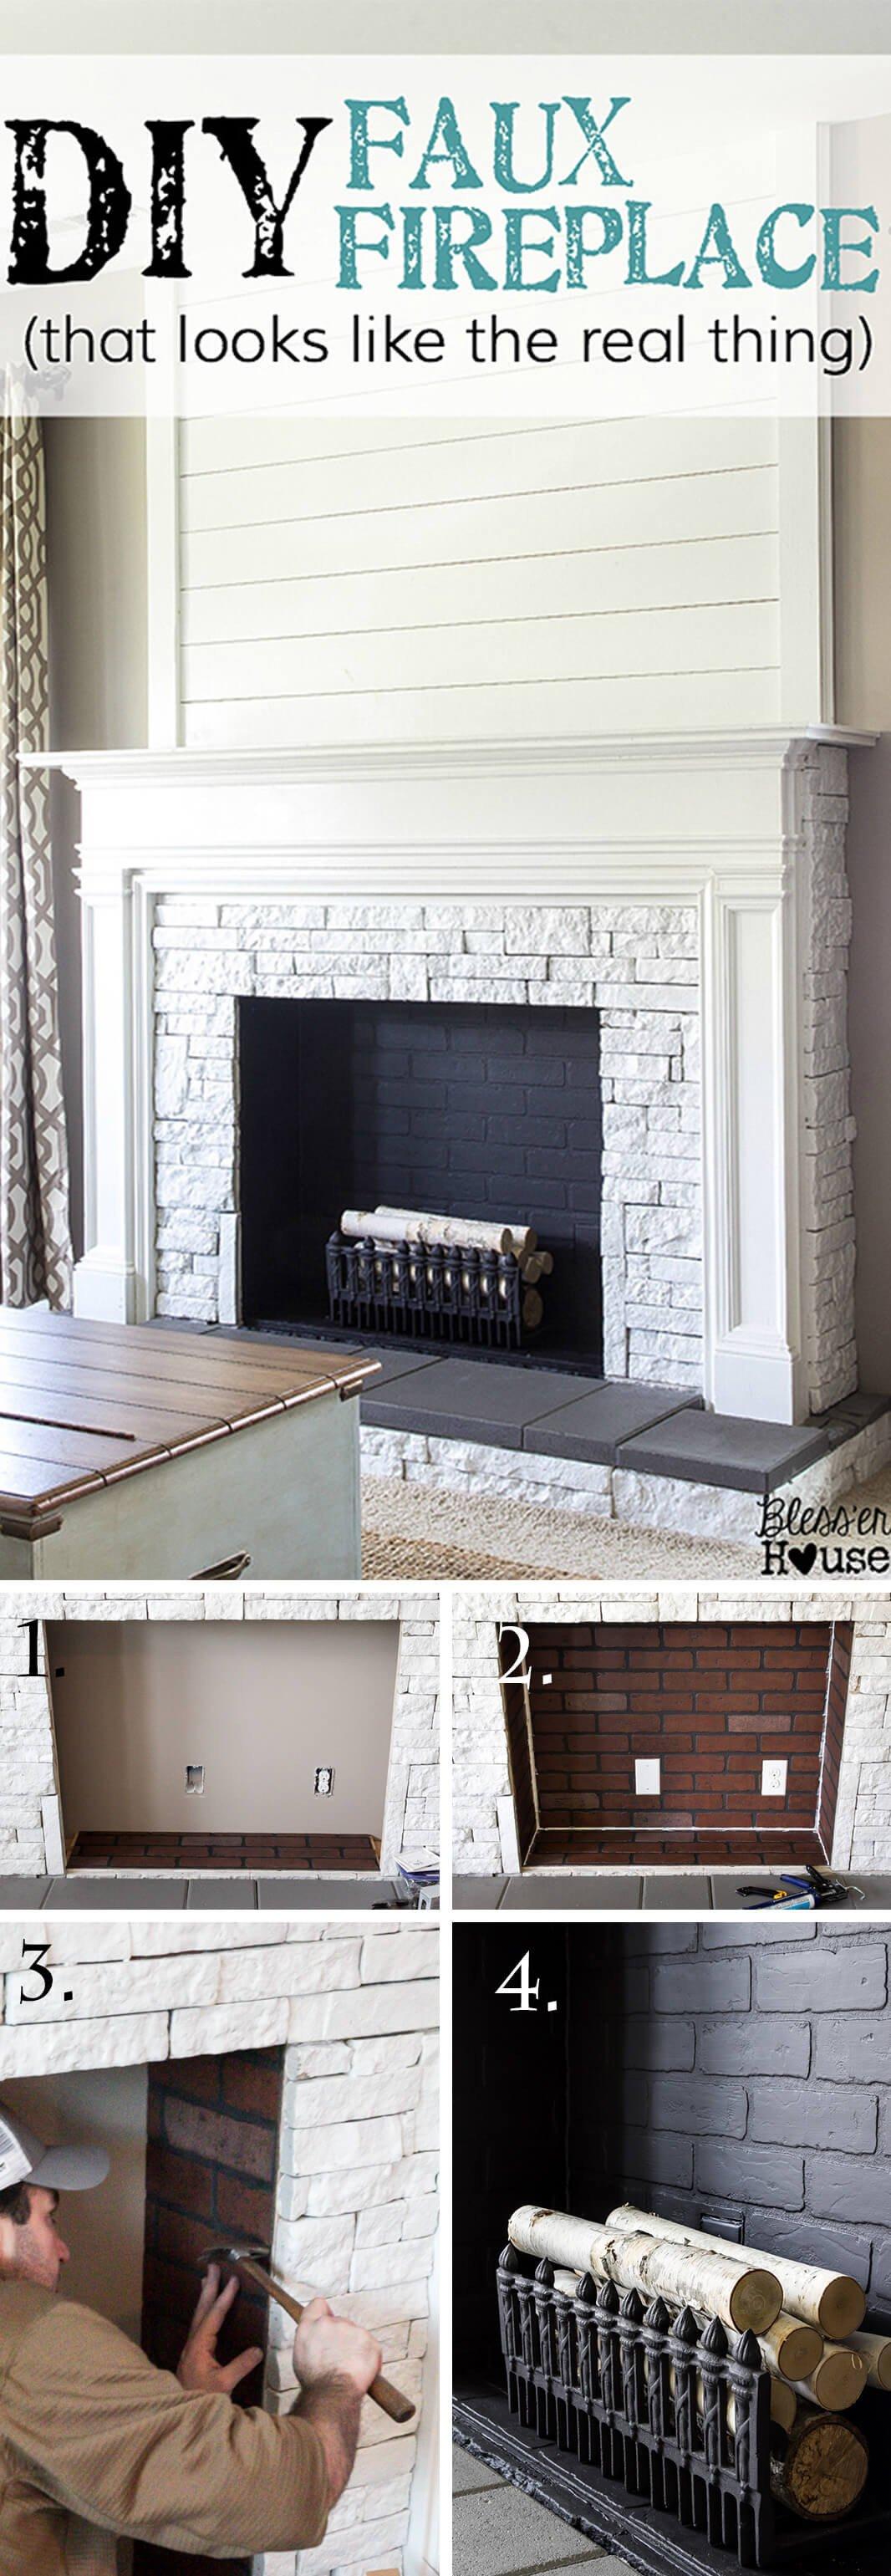 Diy Living Room Decor Ideas Inspirational 45 Best Diy Living Room Decorating Ideas and Designs for 2019